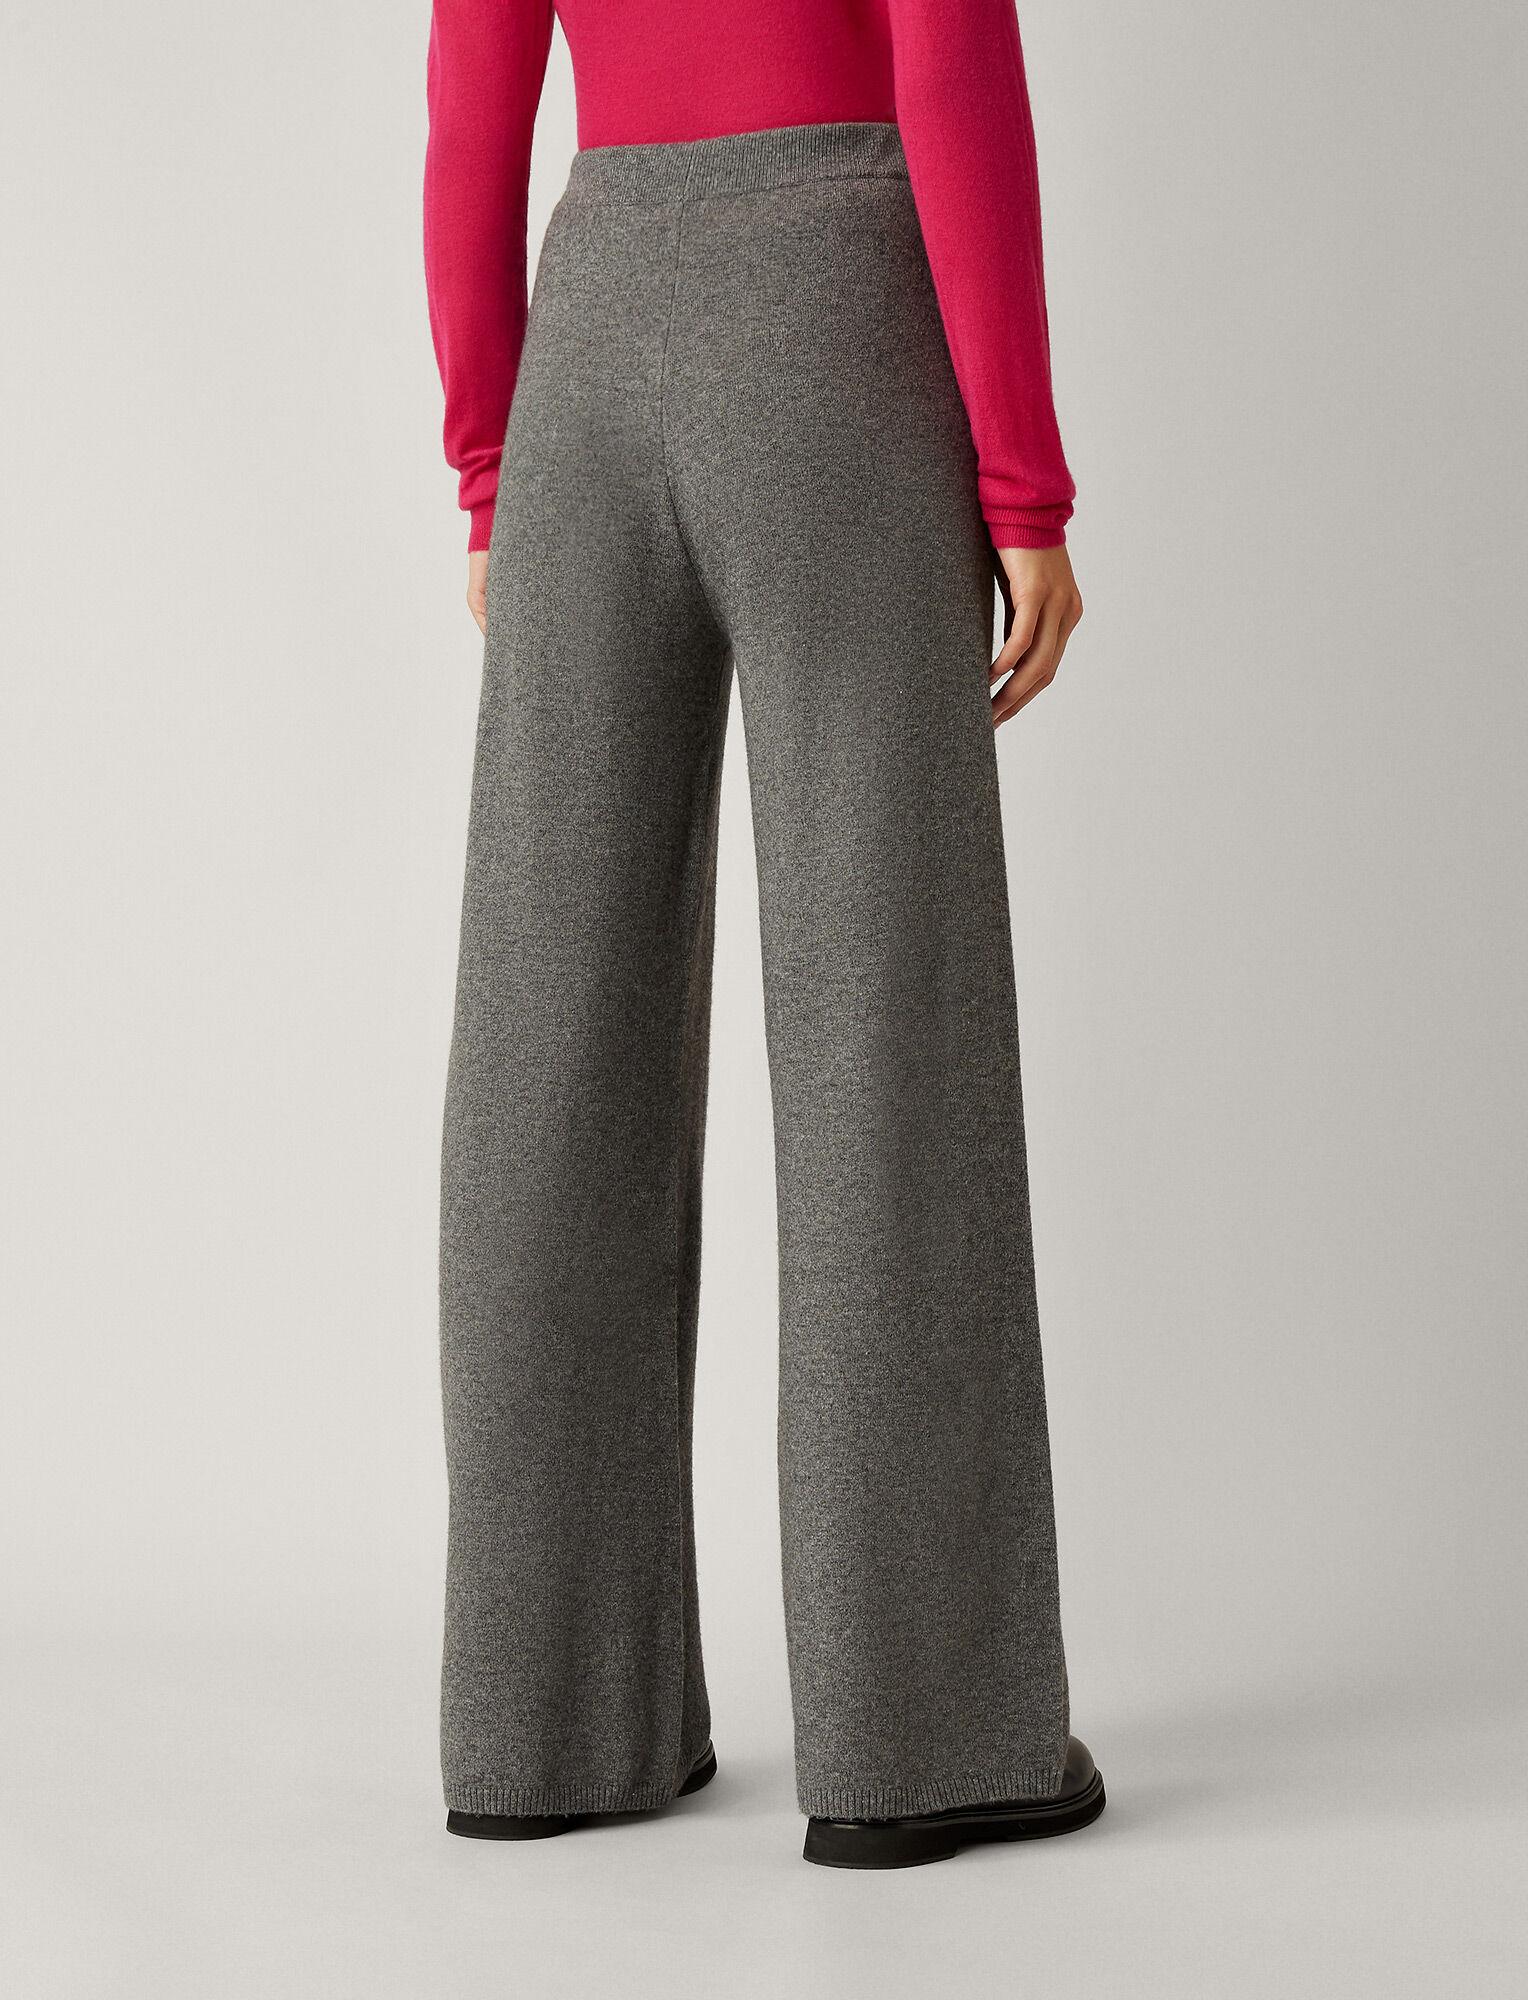 Joseph, Wool Cashmere Knit Trousers, in DARK GREY